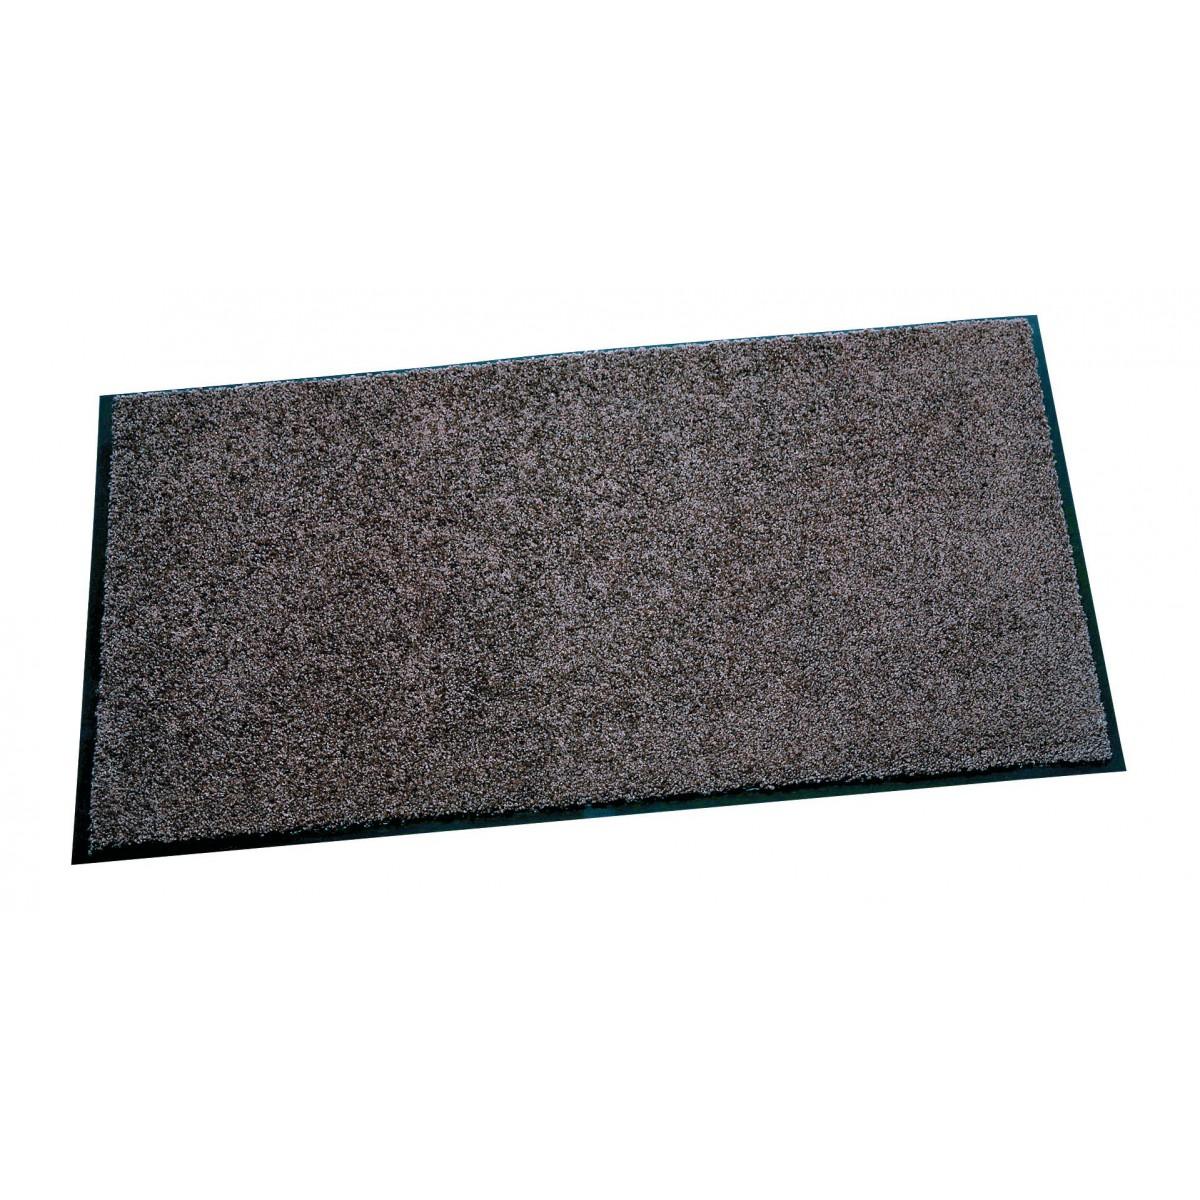 Tapis anti-poussières Mirande - Gris - Dimensions 60 x 80 cm